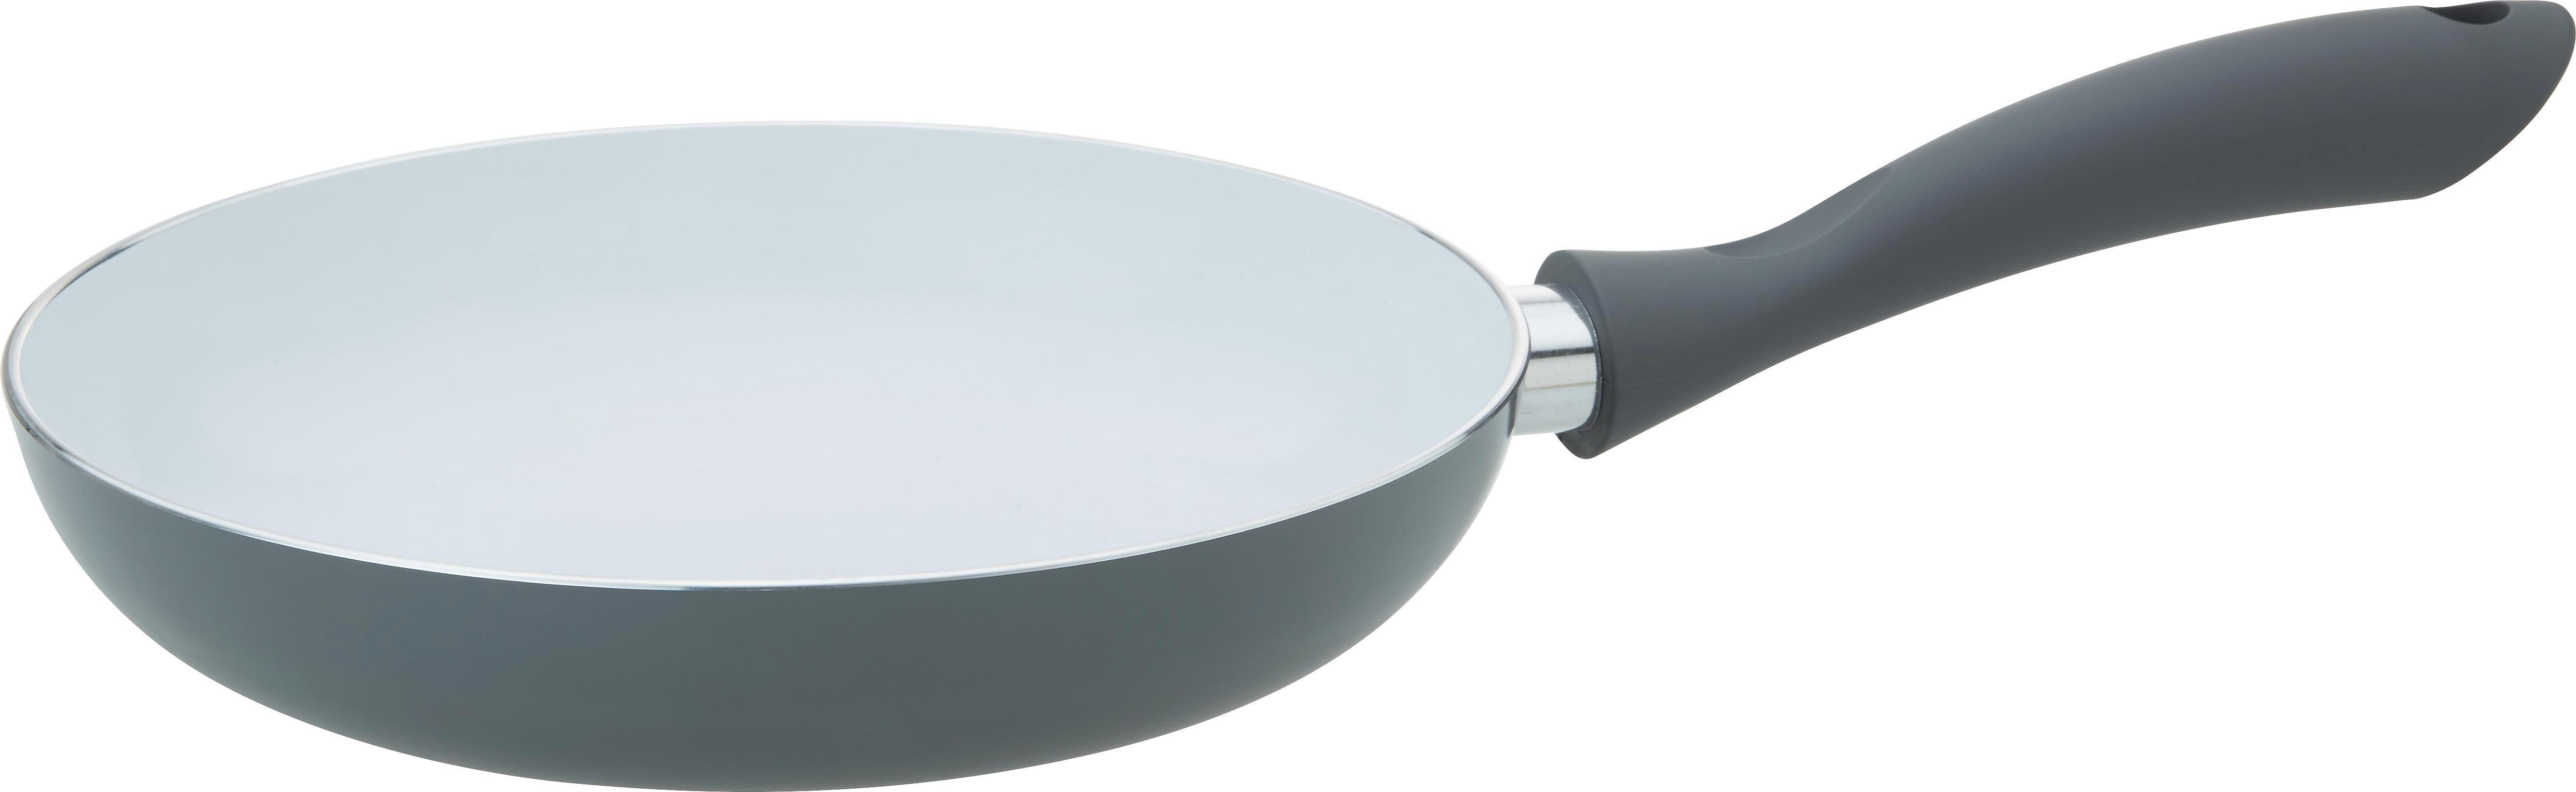 Serpenyő Sonia - fehér/szürke, modern, műanyag/fém (24cm) - MÖMAX modern living